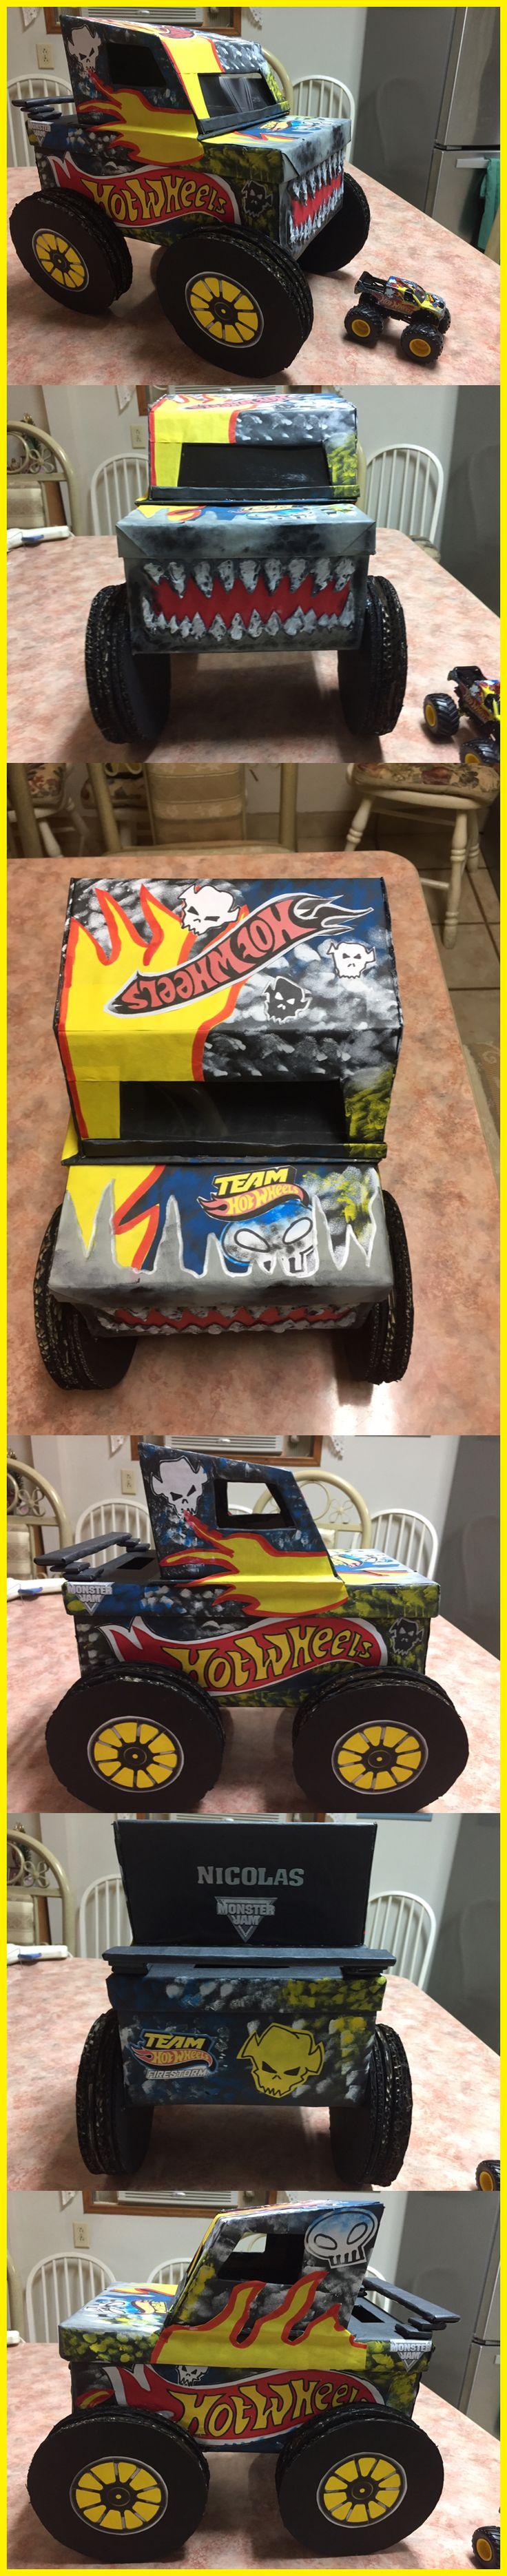 Valentines box - Monster truck: Team hot wheels